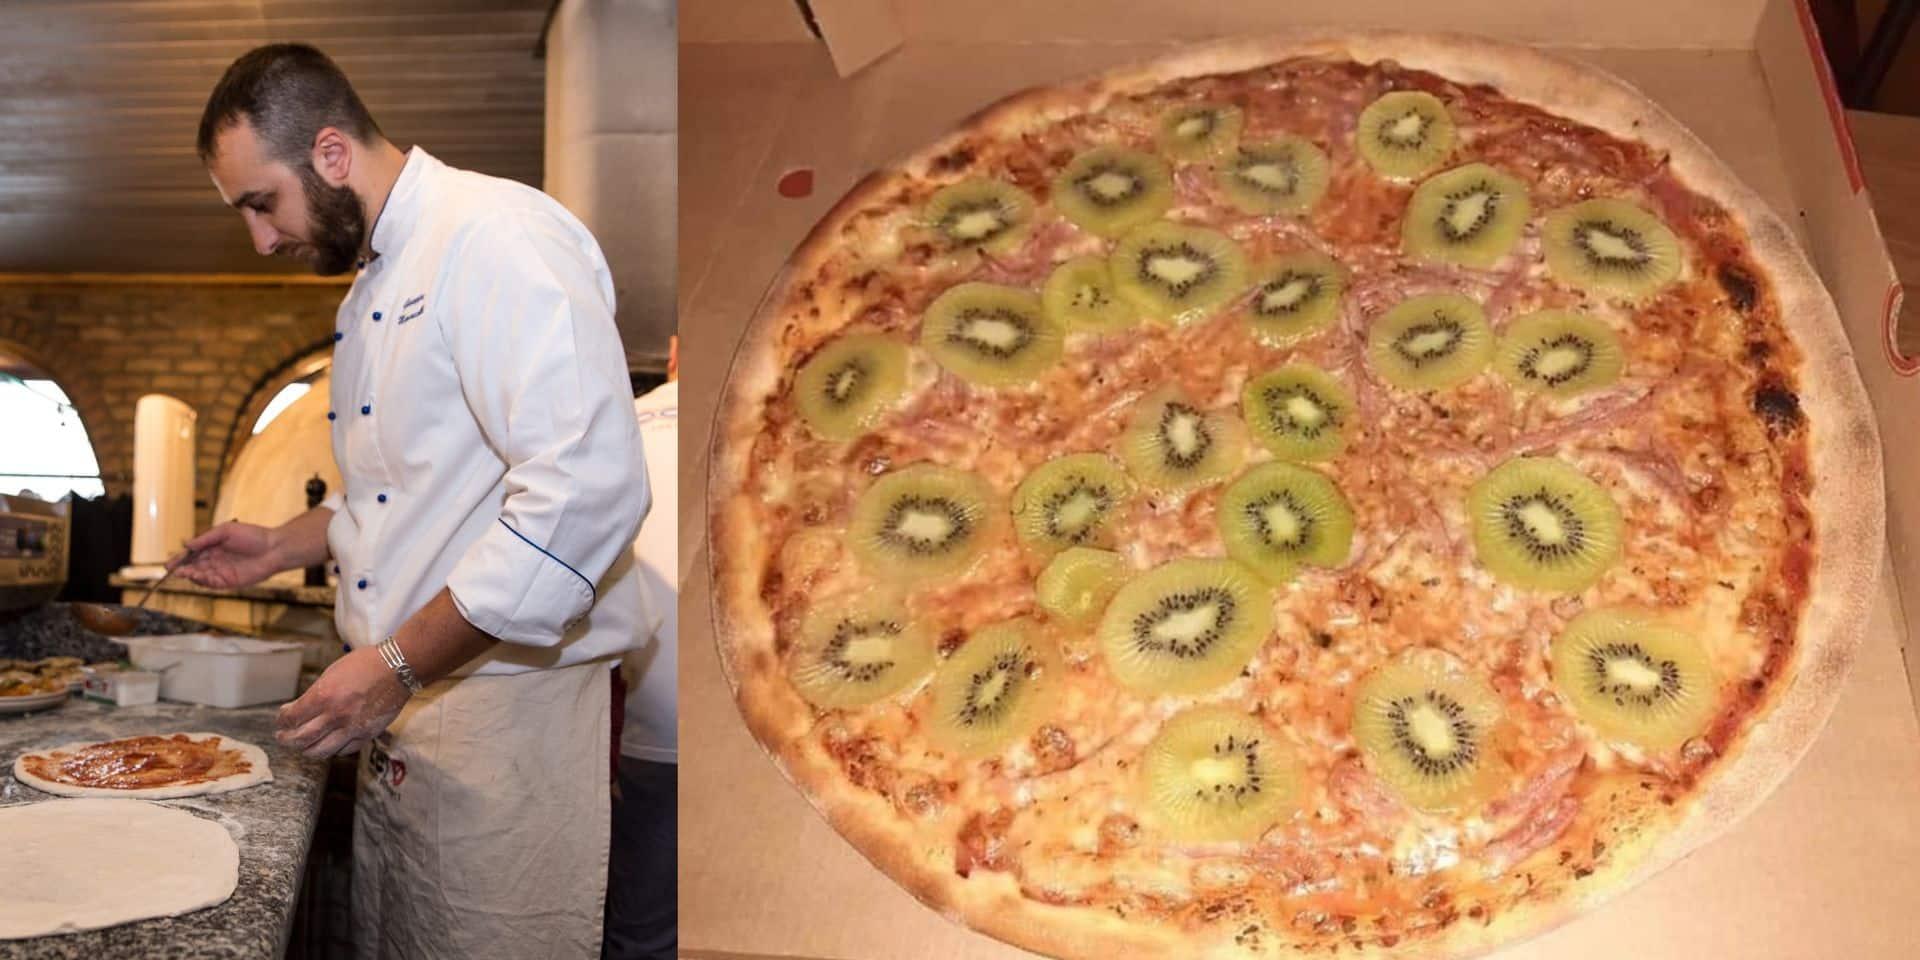 Après la pizza hawaïenne, voici la pizza... au kiwi